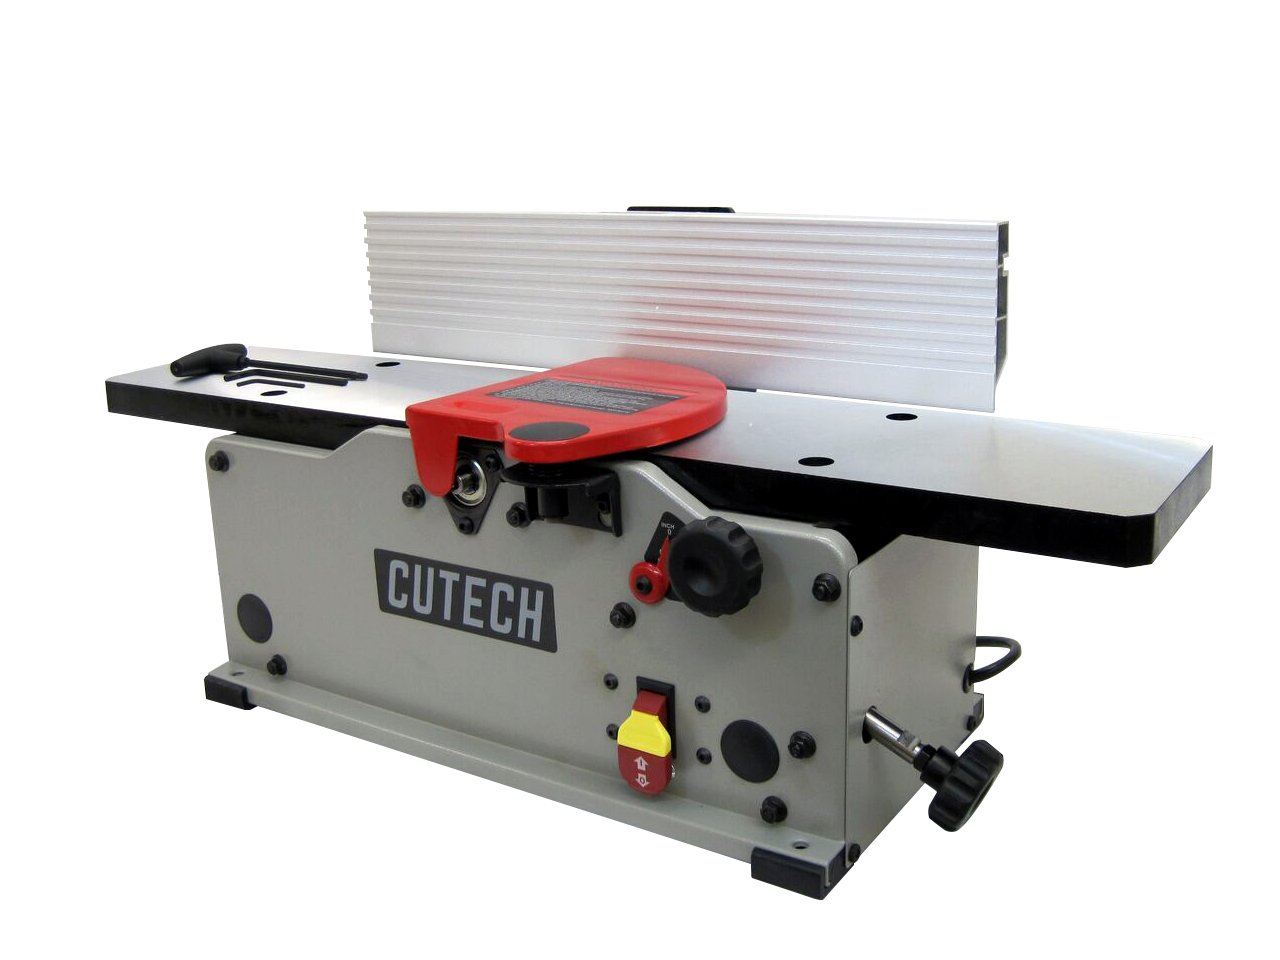 "Cutech 40160H-CT 6"" Bench Top Jointer"